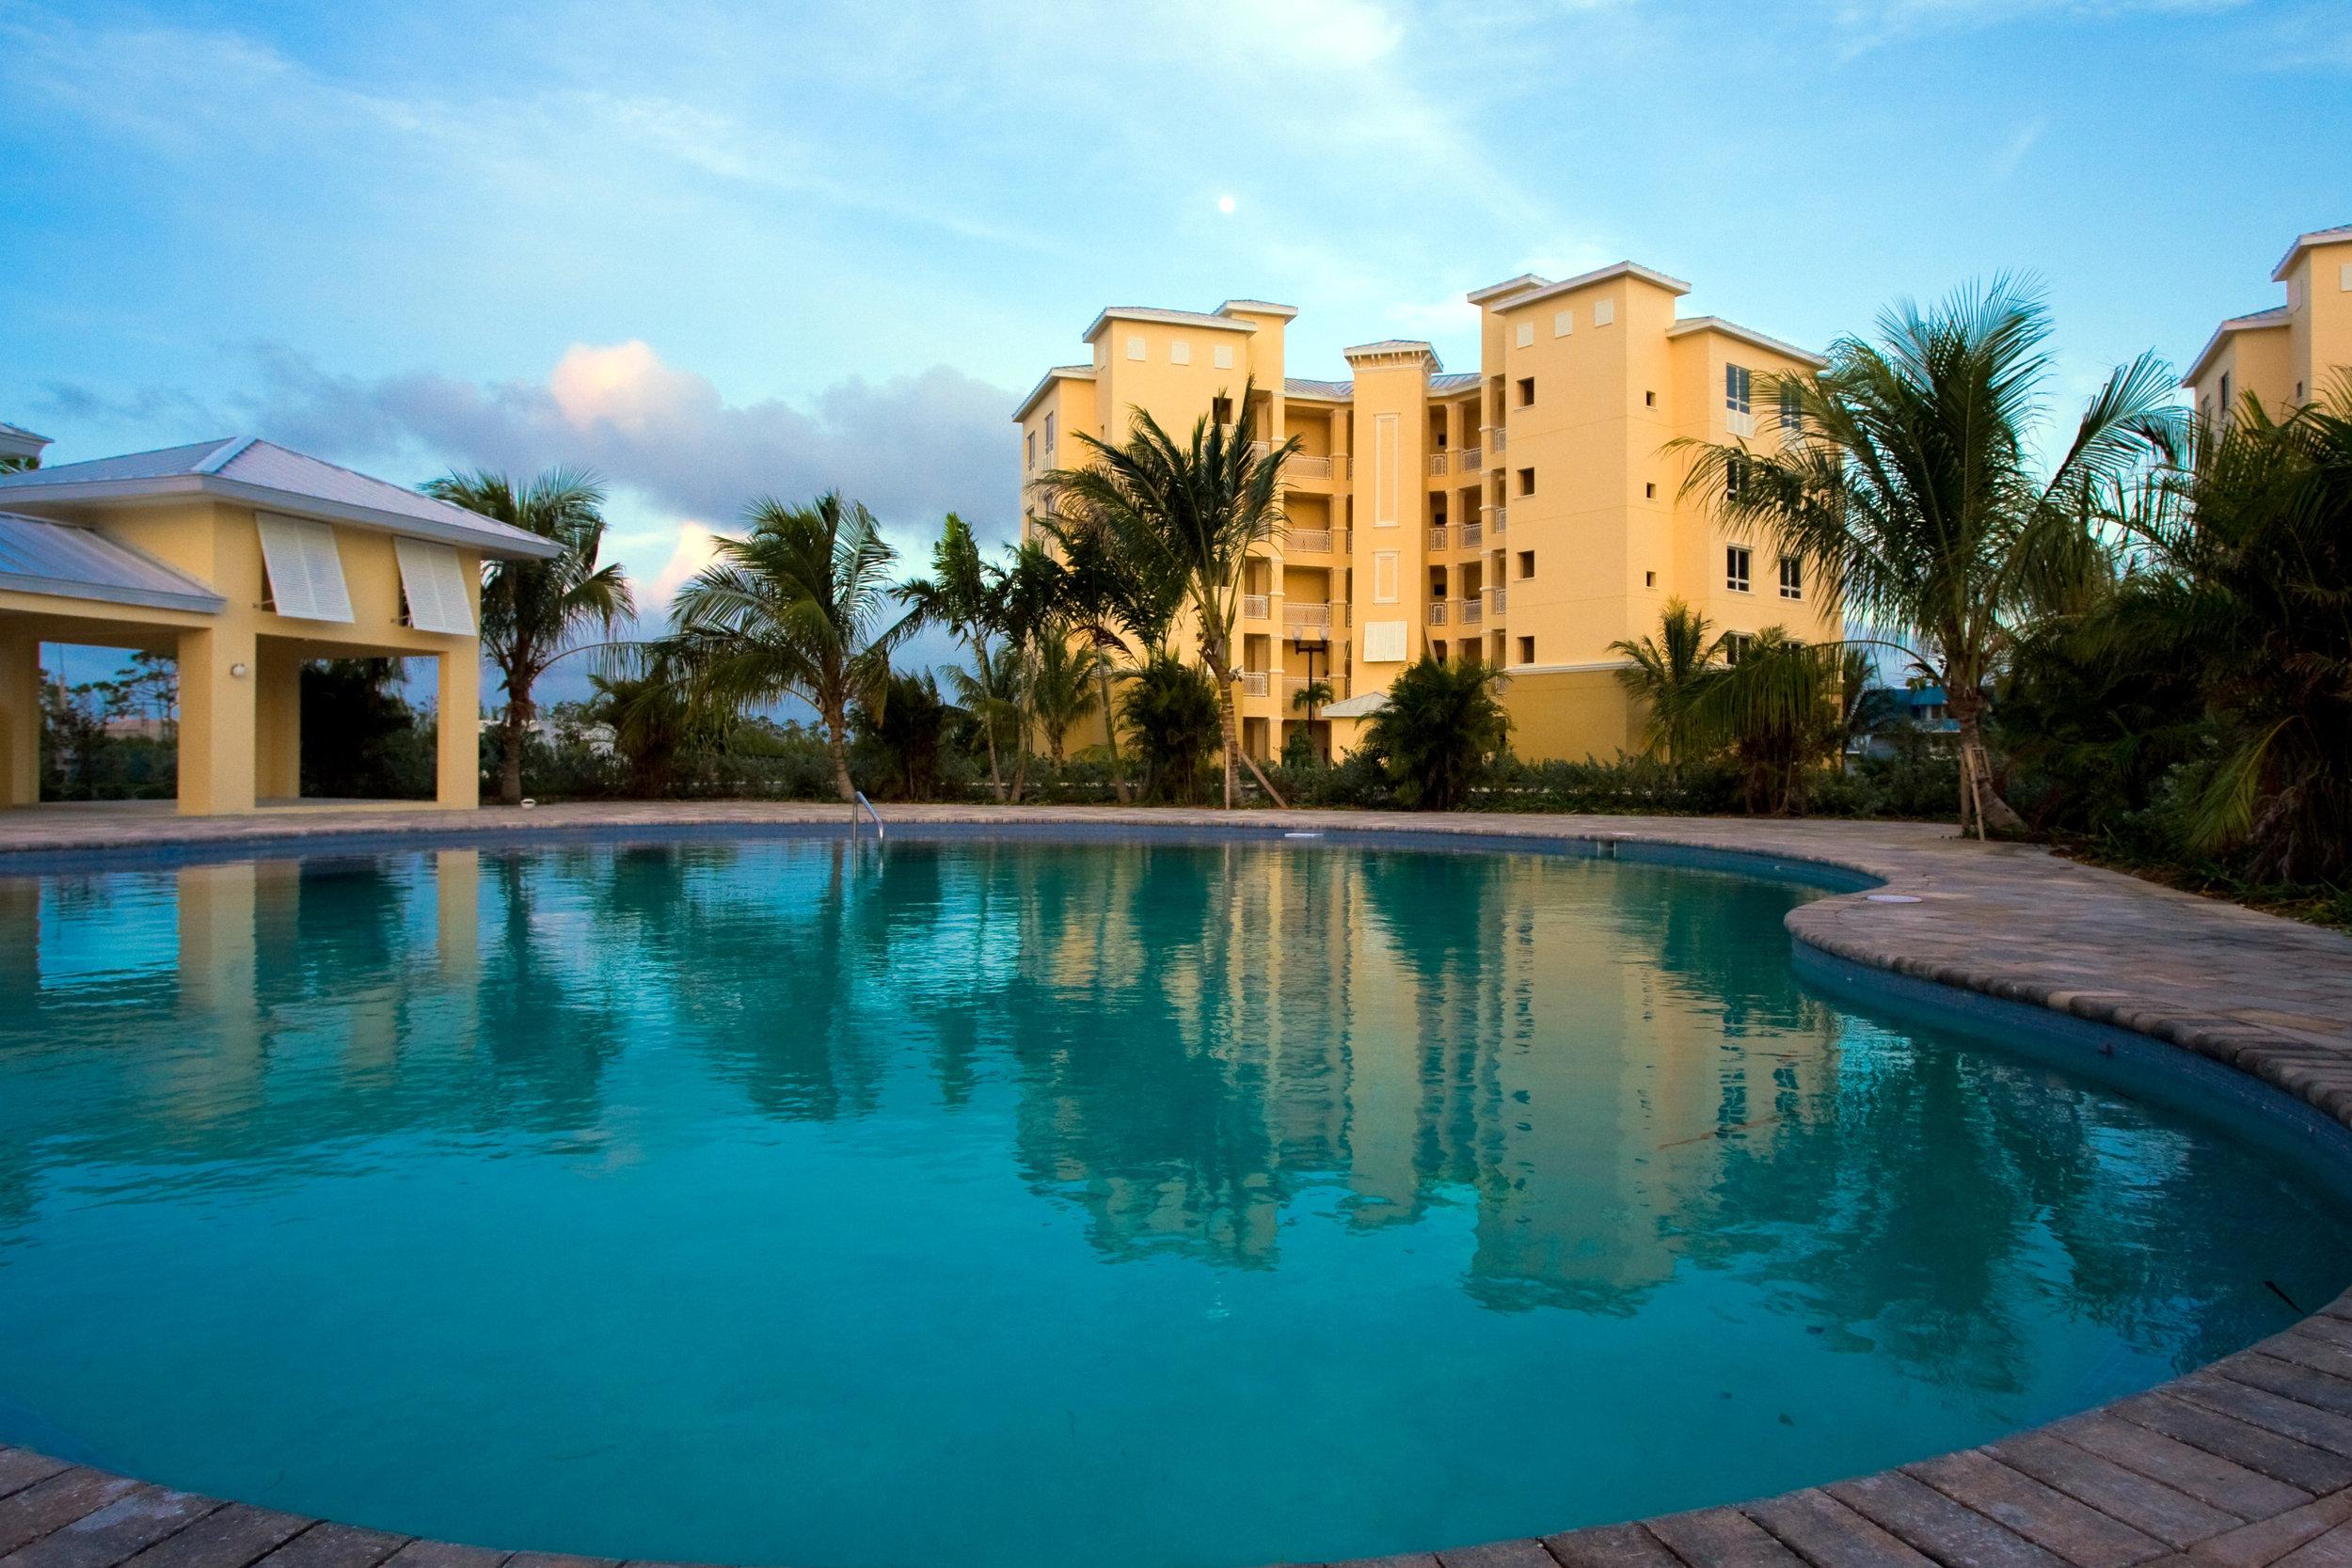 Suffolk Court Bahamas exterior pool dusk.jpg